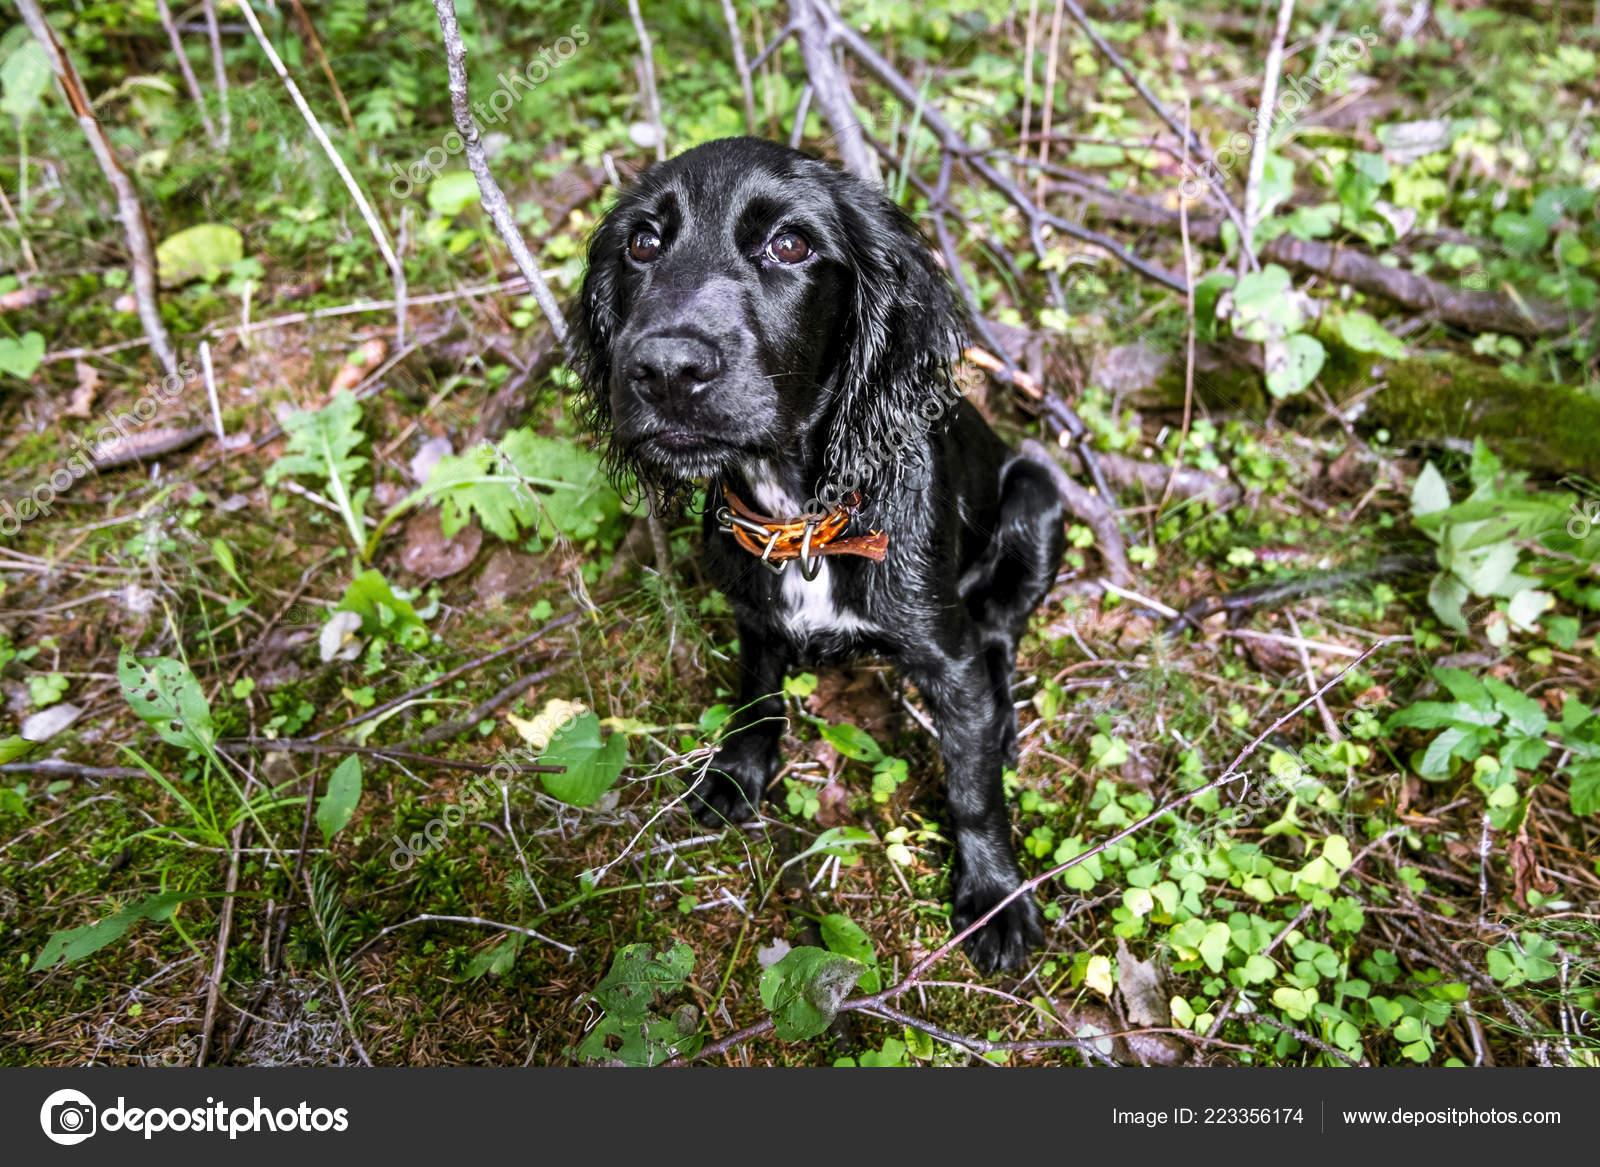 Cute Black Cocker Spaniel Puppy Sitting Green Grass Stock Photo C Toshket 223356174